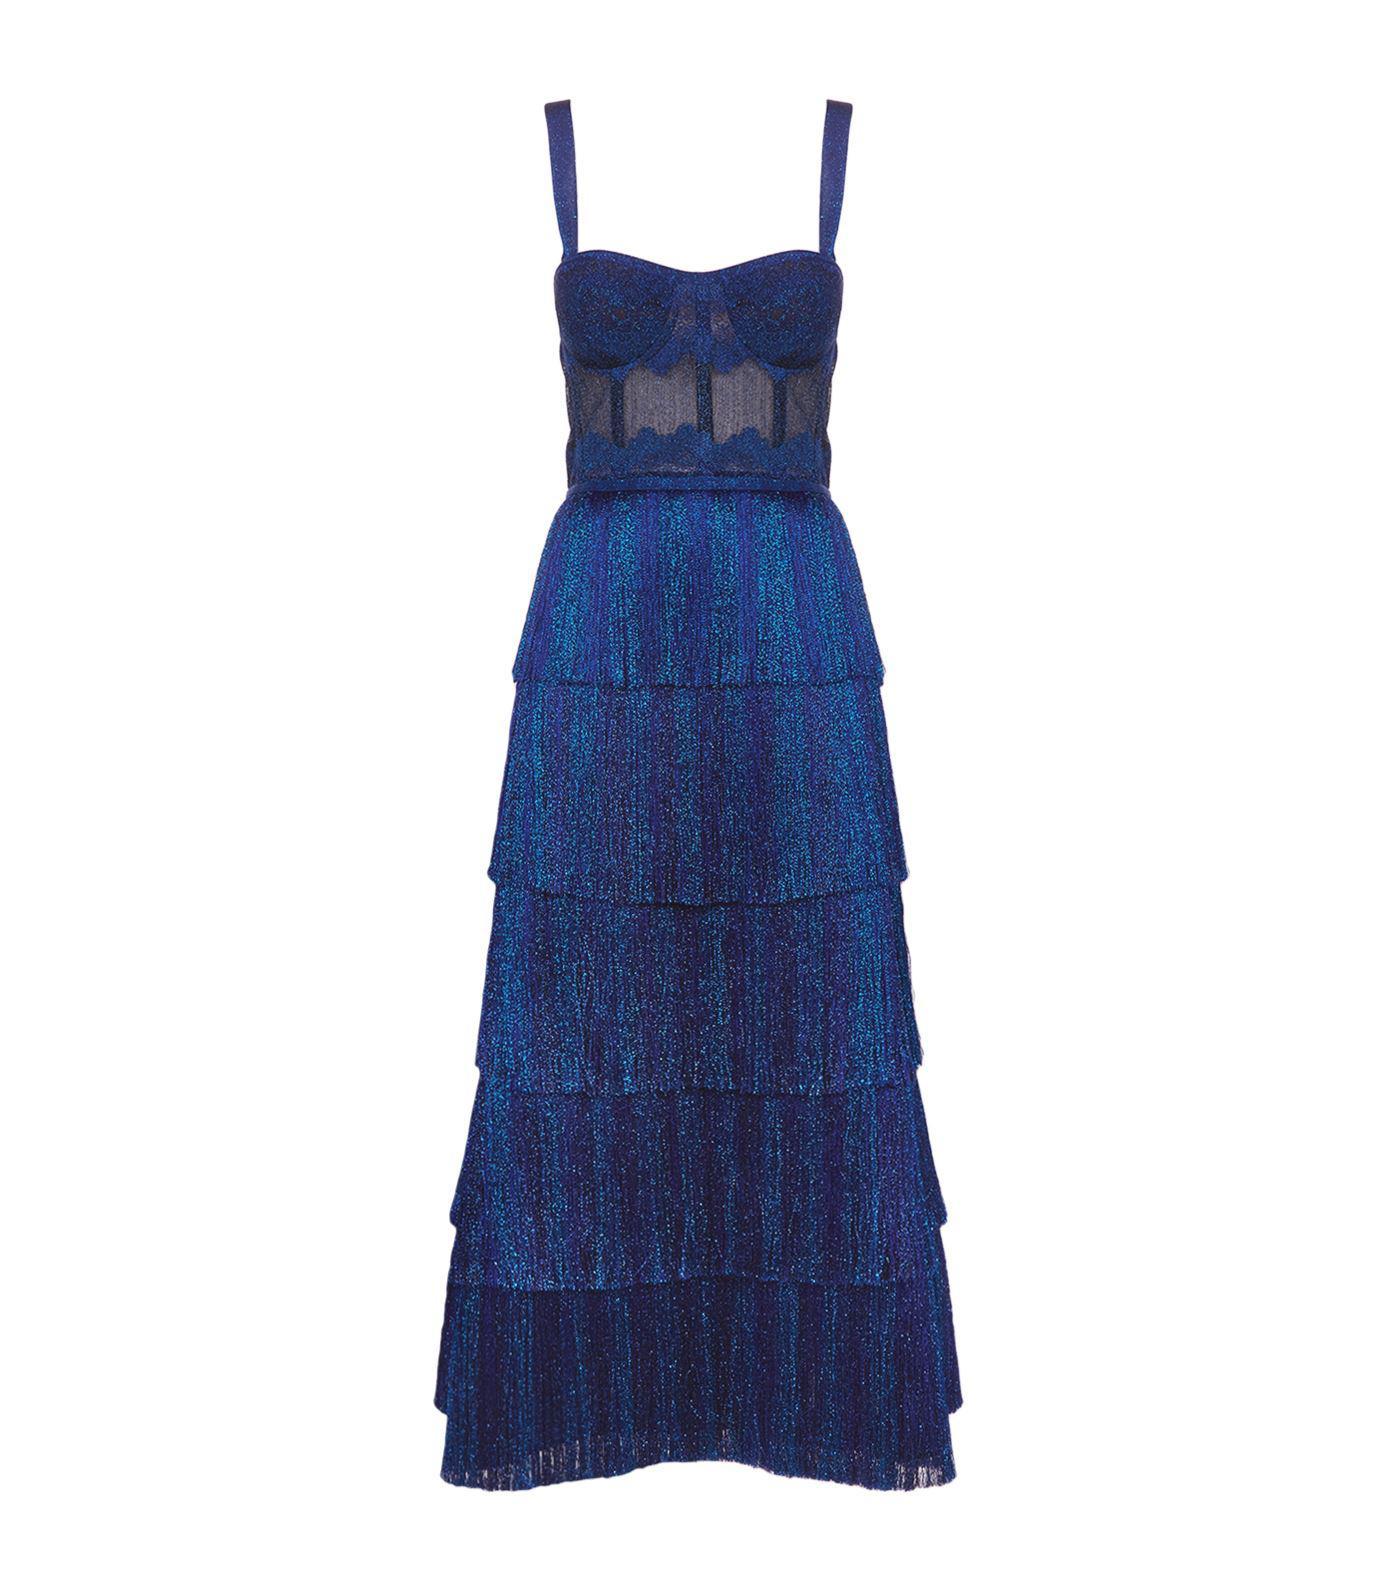 Lyst - Missoni Lurex Fringed Bustier Gown in Blue - Save 6%